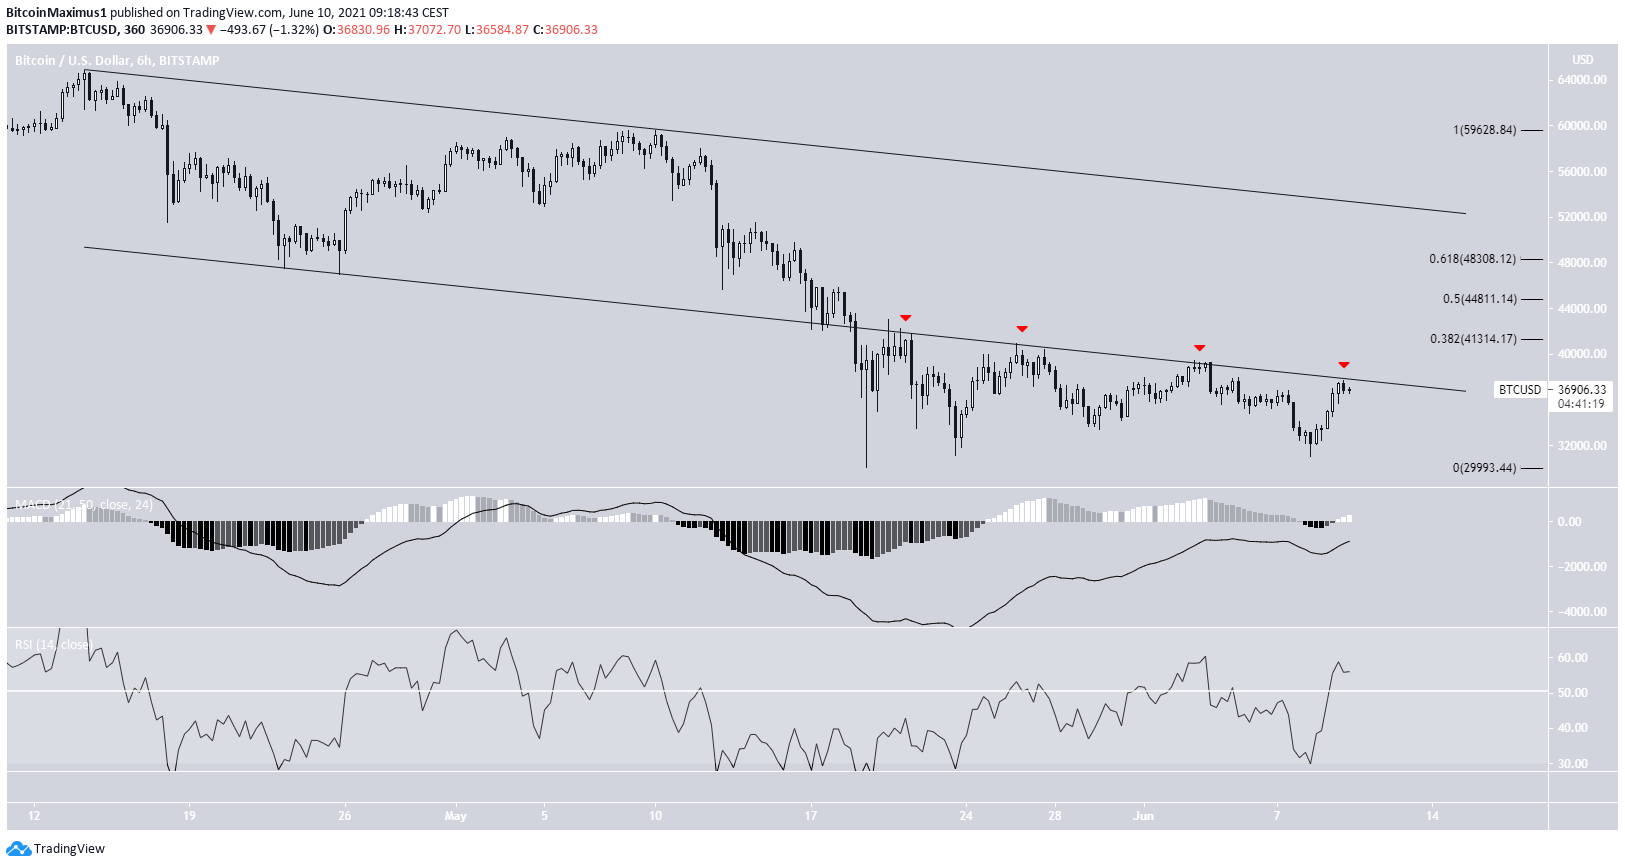 BTC Breakdown